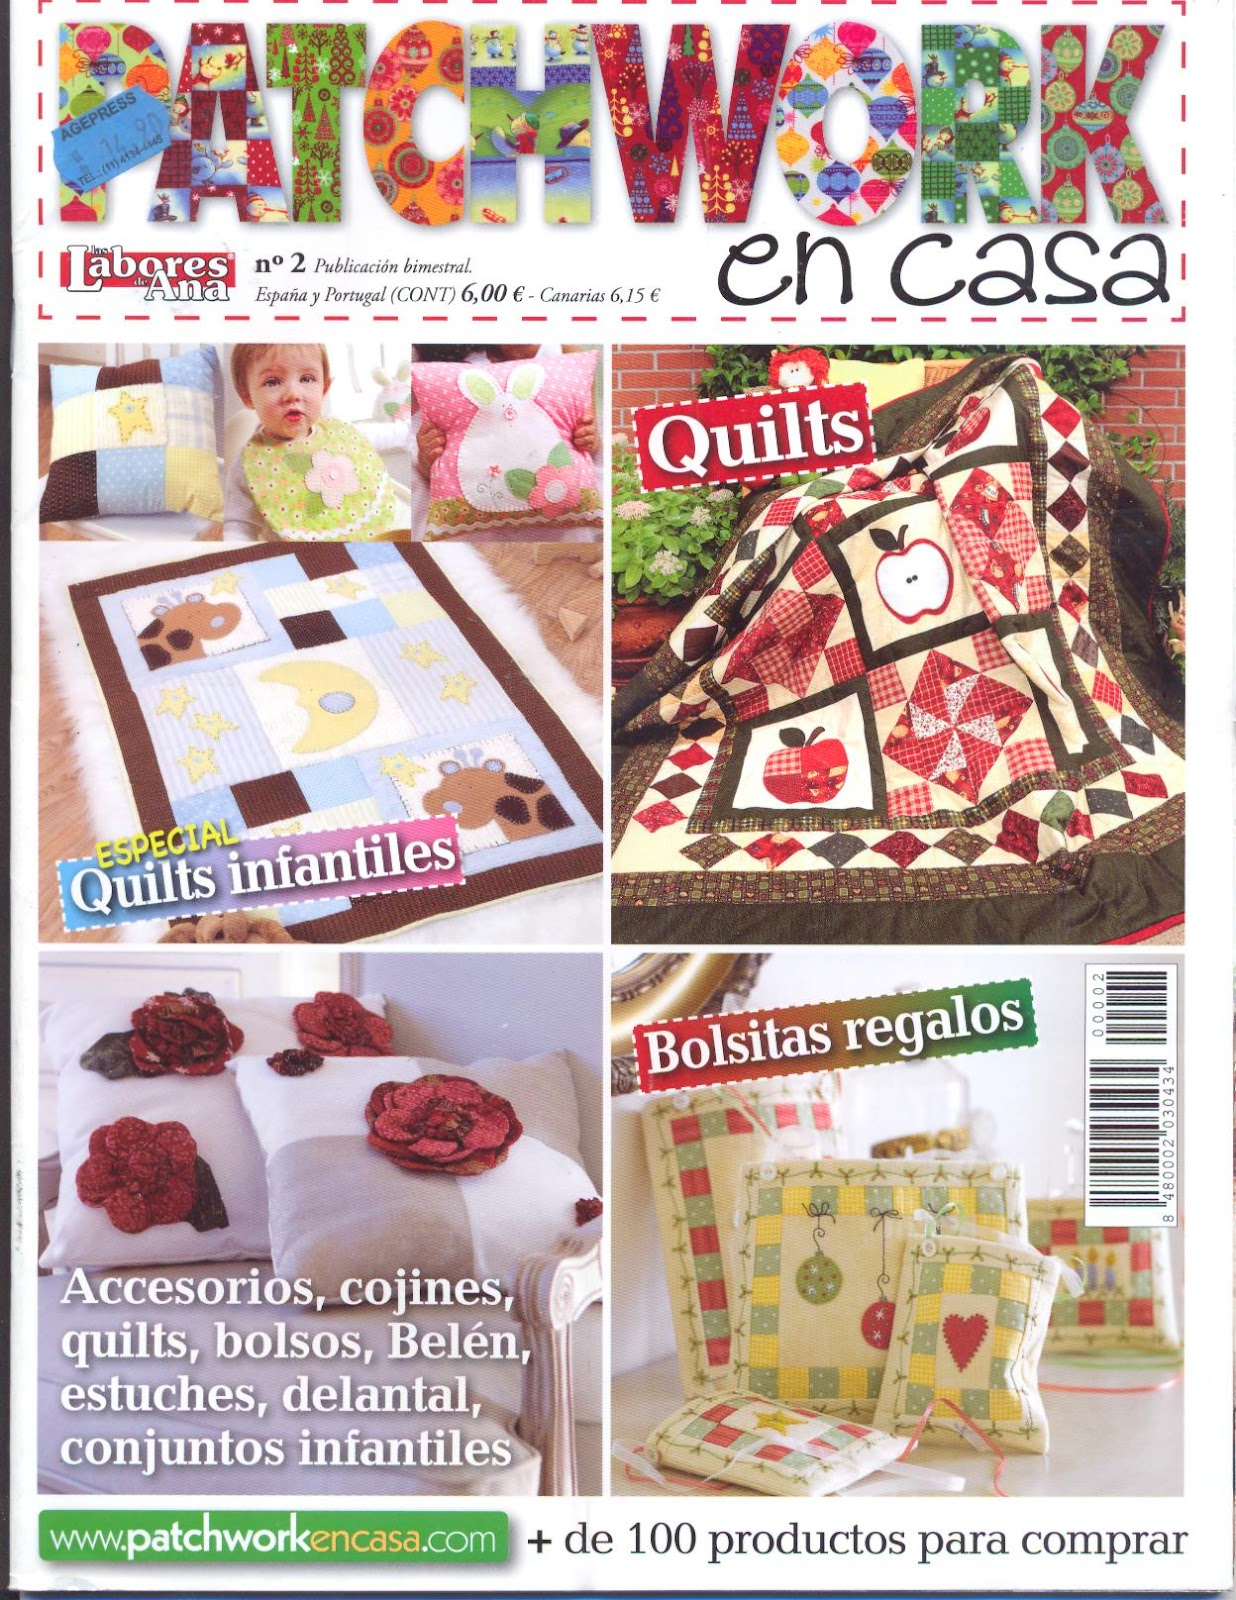 Luz weber revista patchwork en casa - Patchwork en casa ...